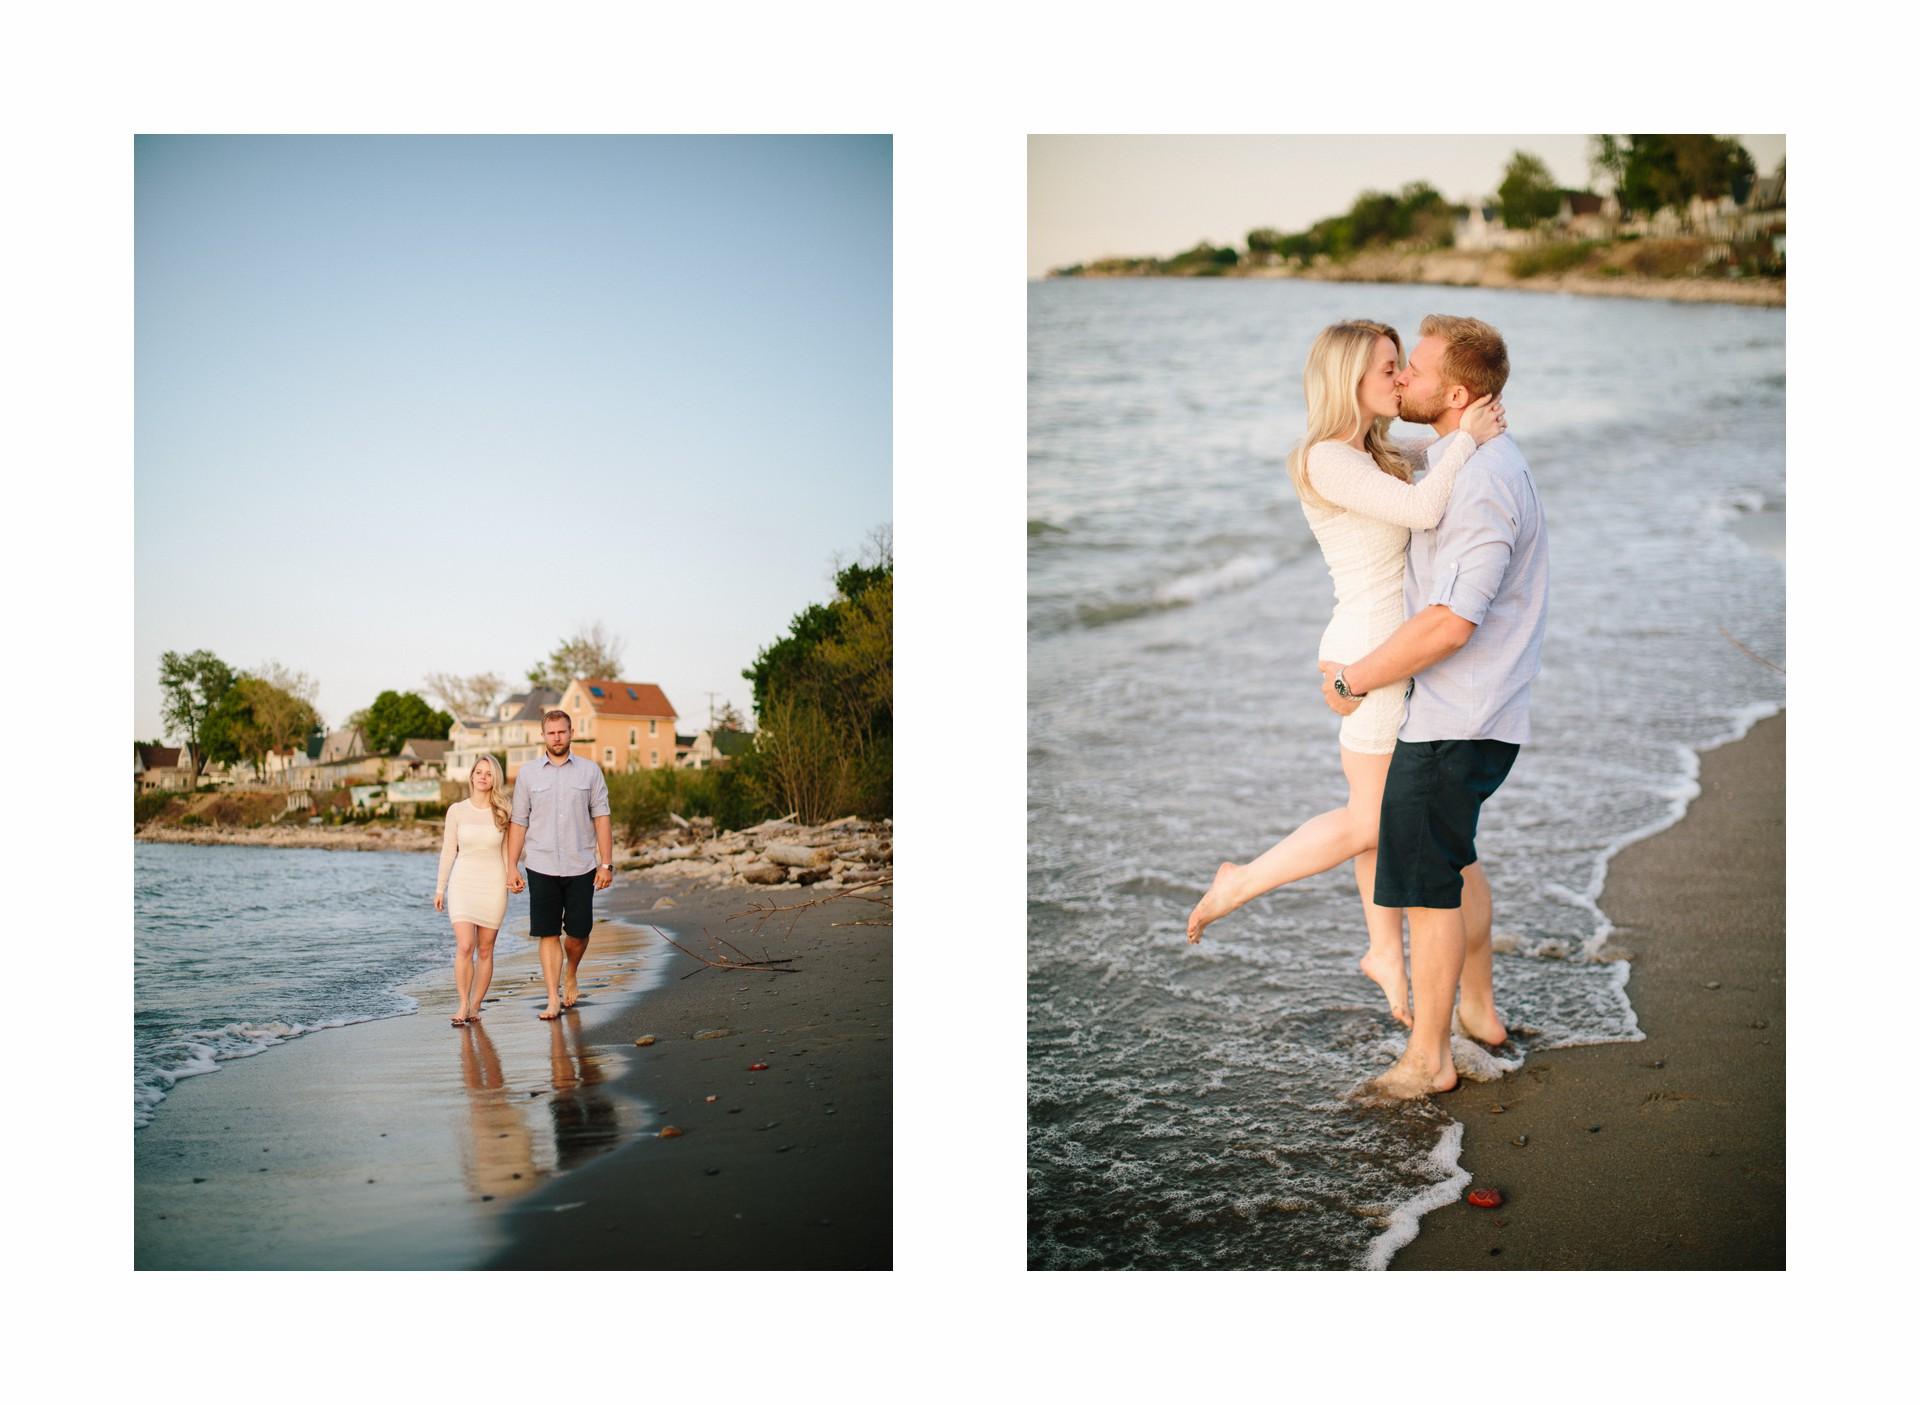 Cleveland Wedding and Engagement Photos 10.jpg